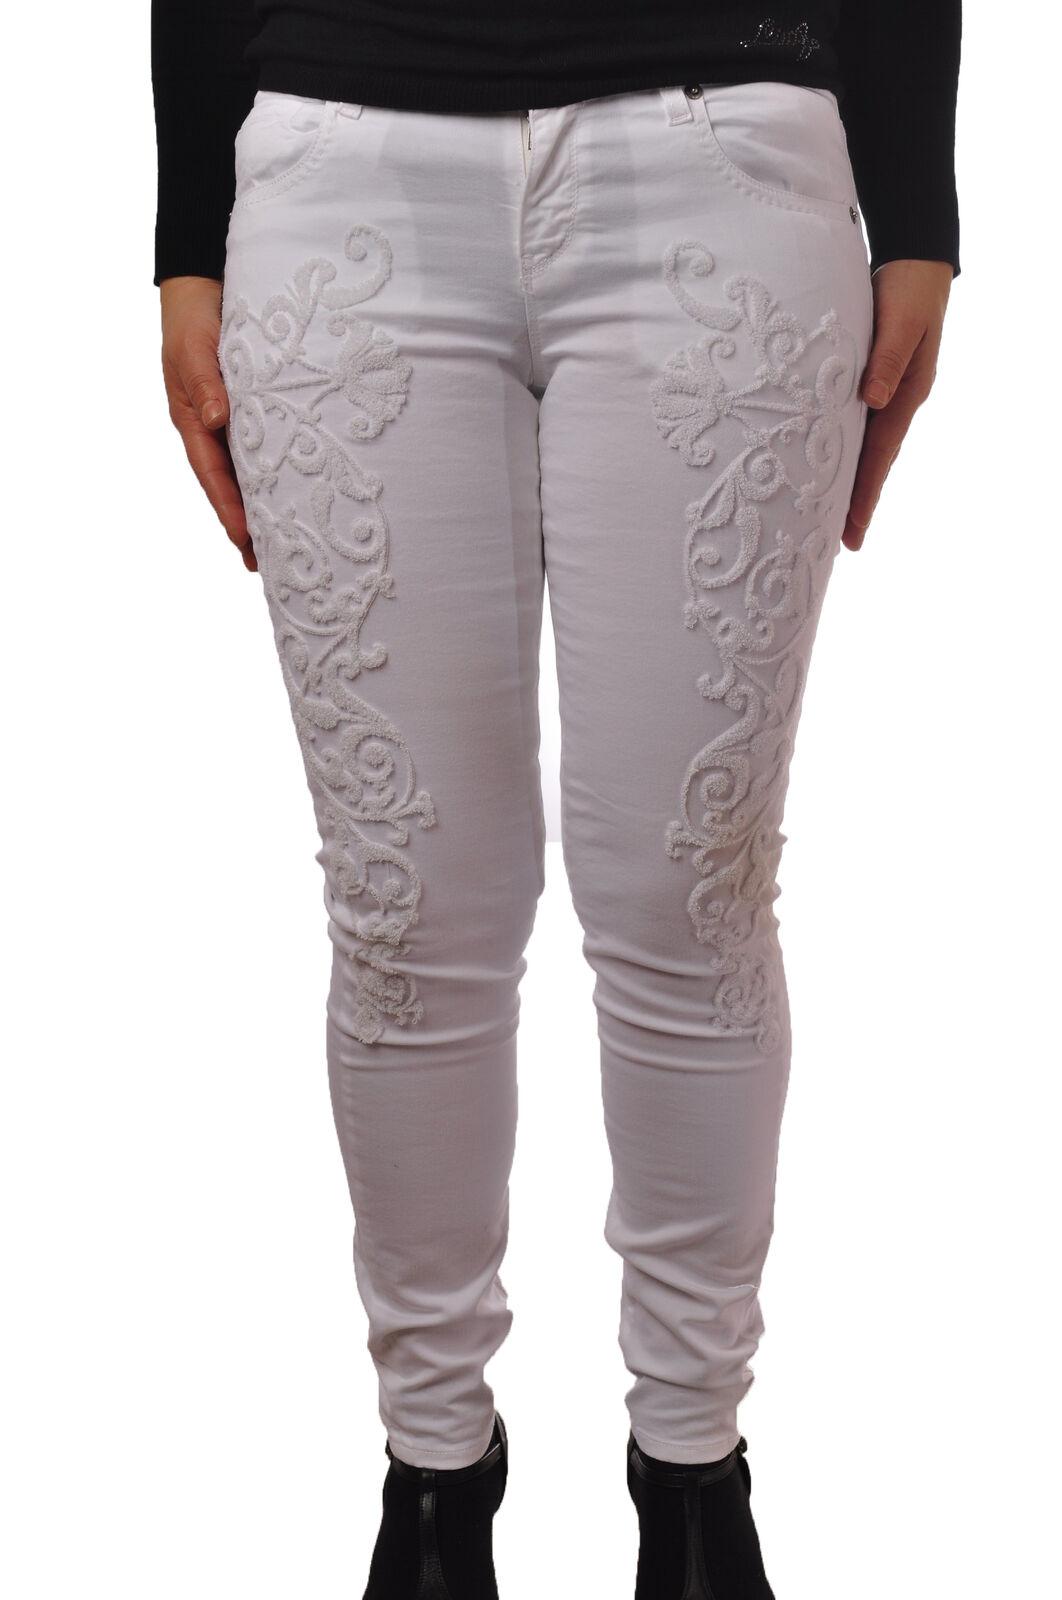 Latinò-Pants-Pantalones-Mujer  - blancoo - 4824802F184522  ganancia cero